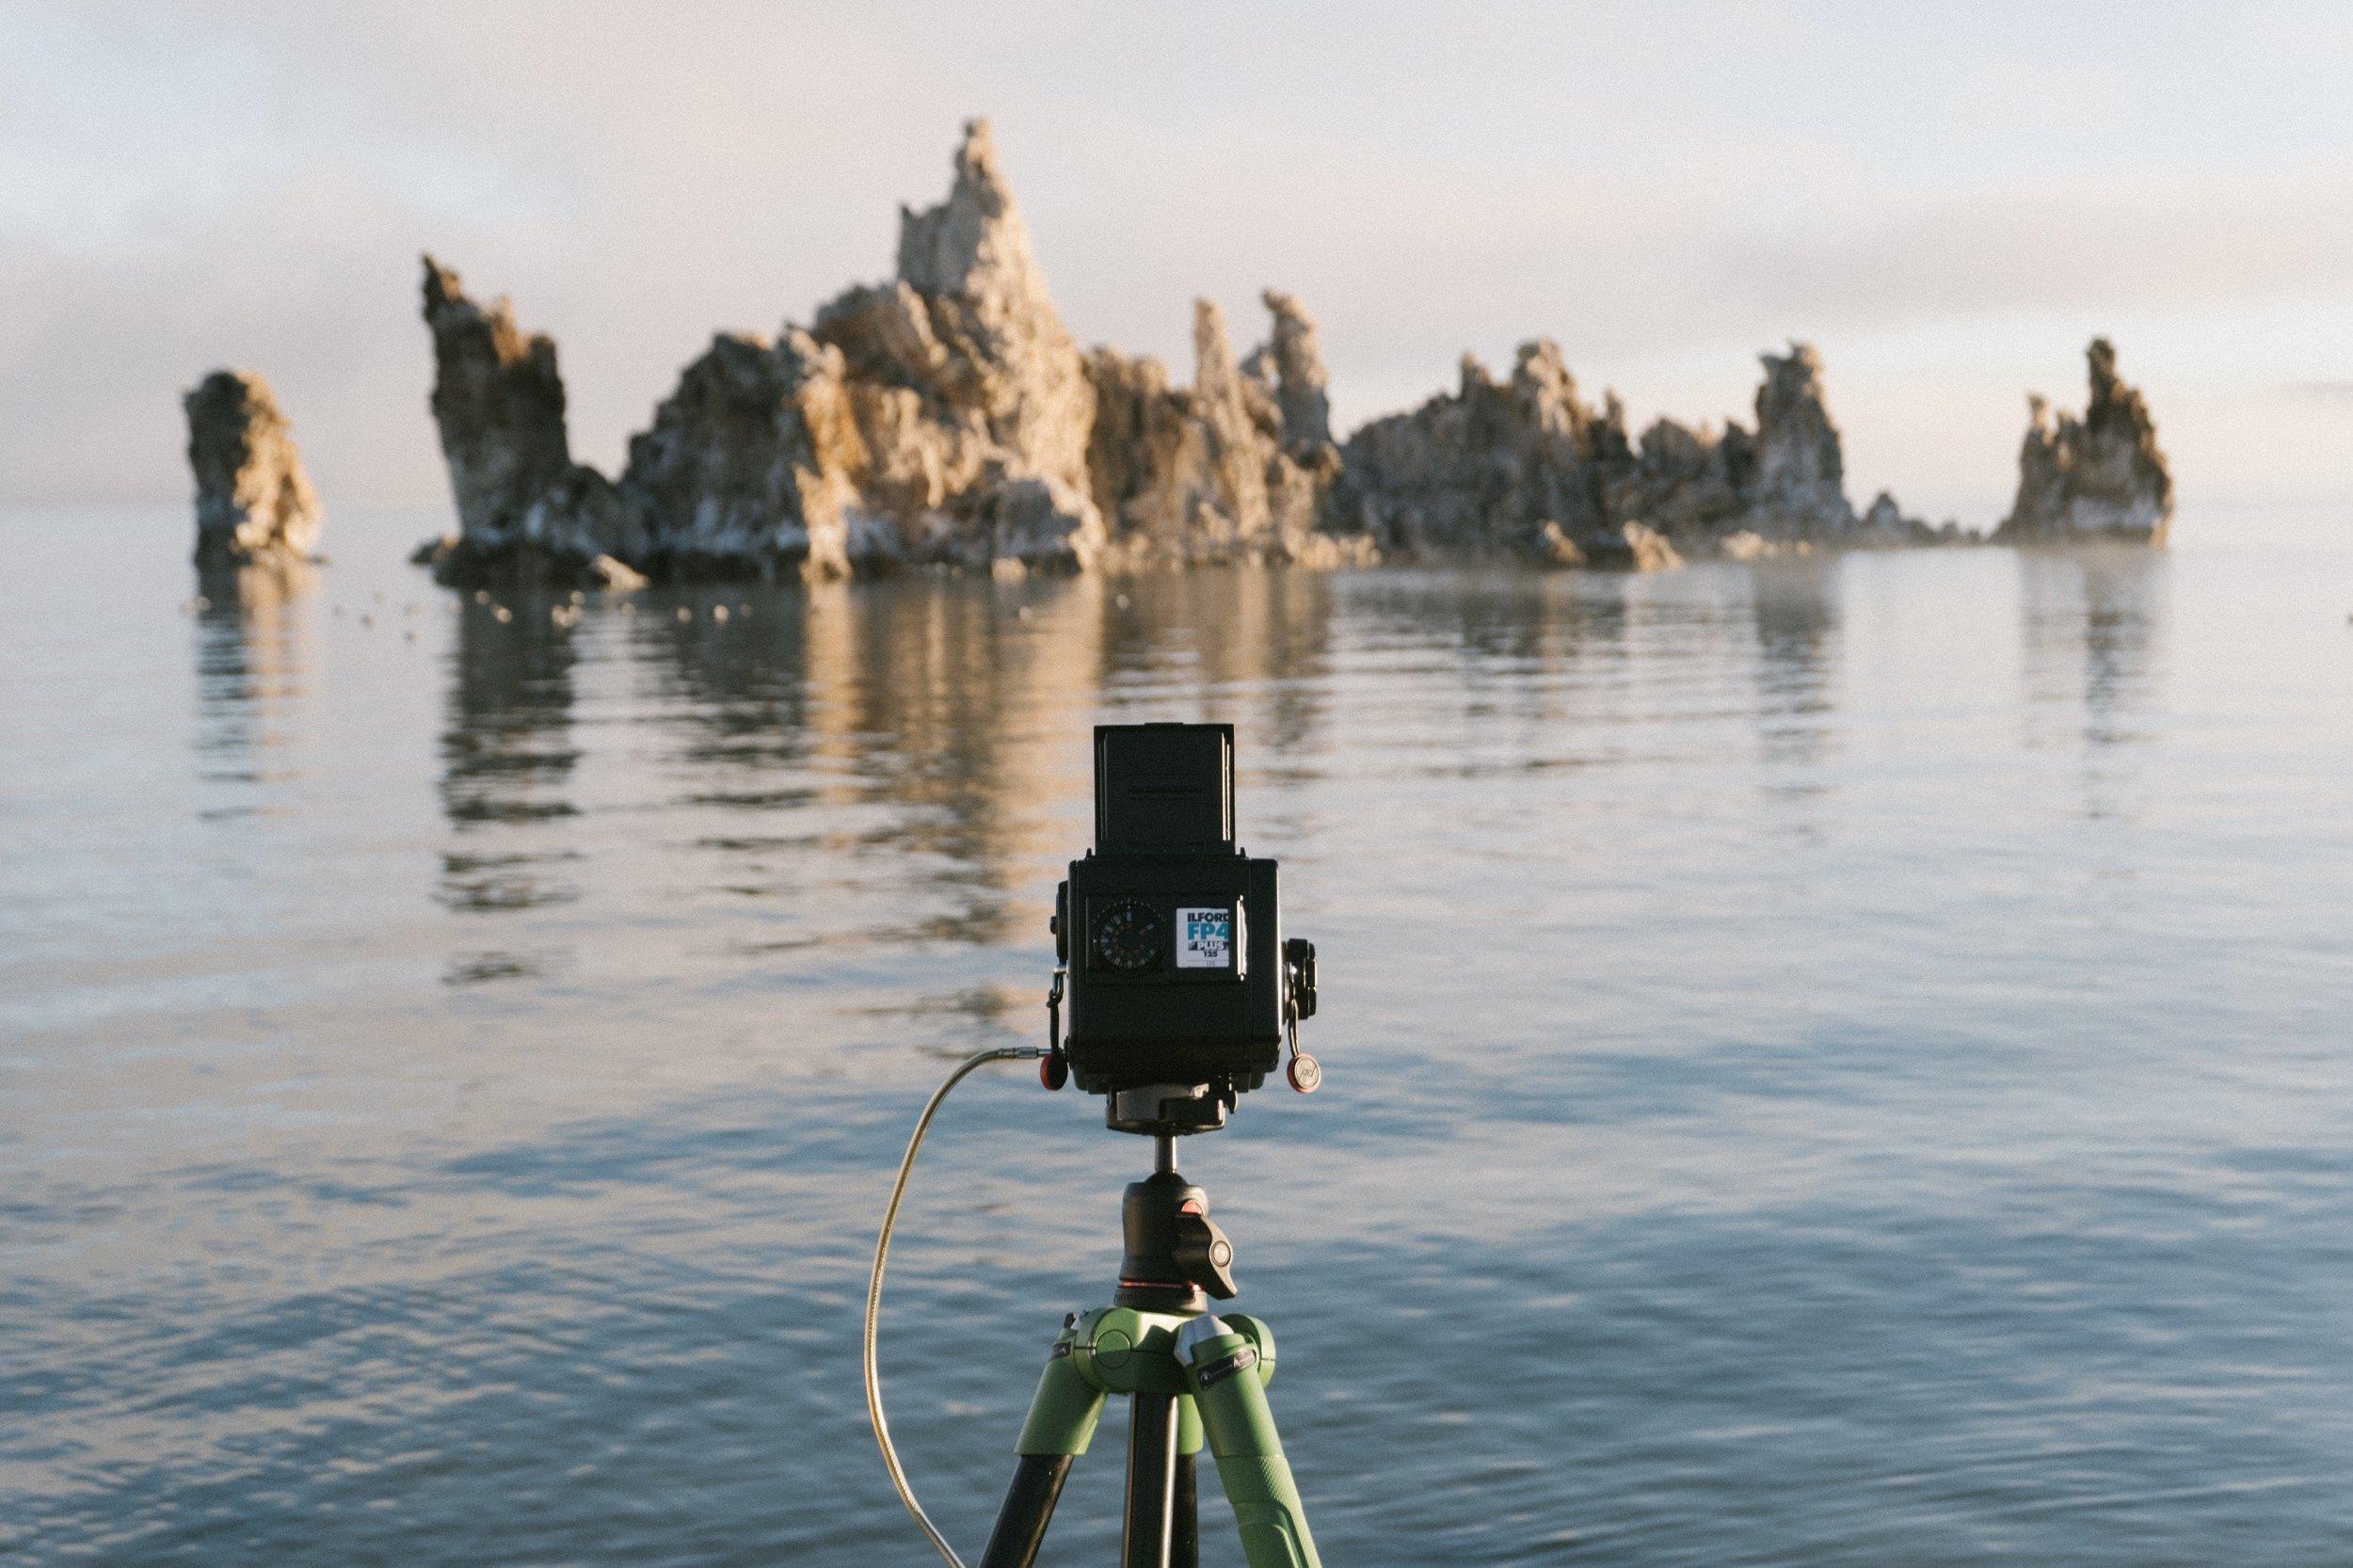 Taking a long exposure in Mono Lake, California